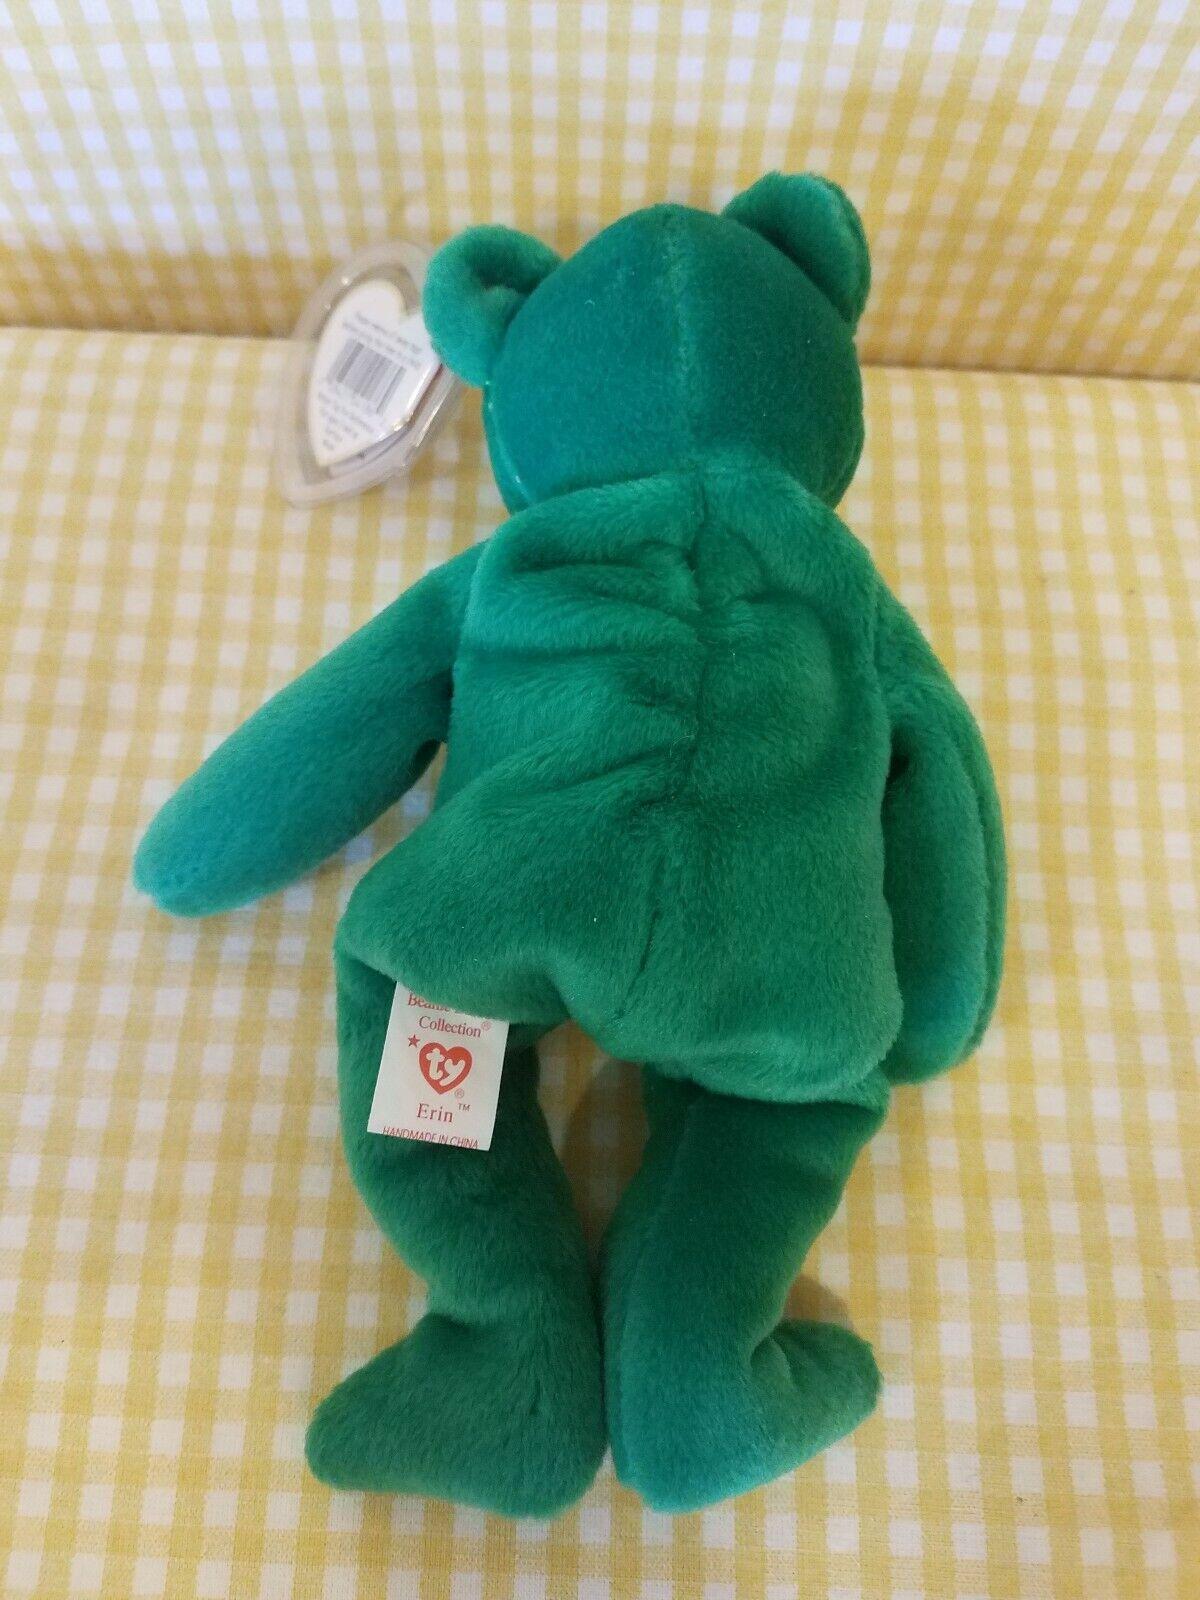 Ty Beanie Baby  Erin the Irish green green green bear HTF GASPORT Error  MWMT  7.5  1997 3932d4